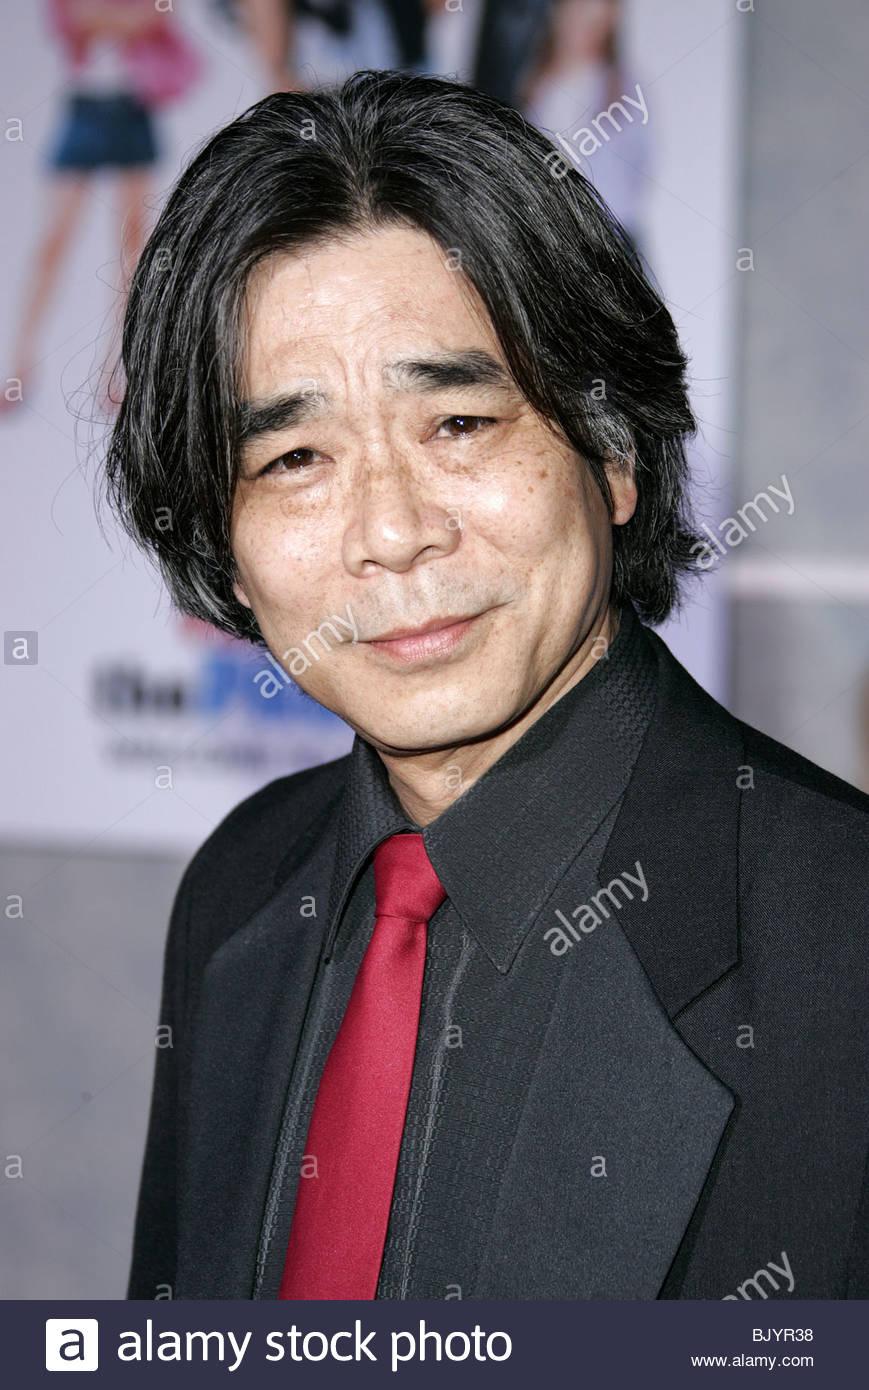 Denis Akiyama nude photos 2019